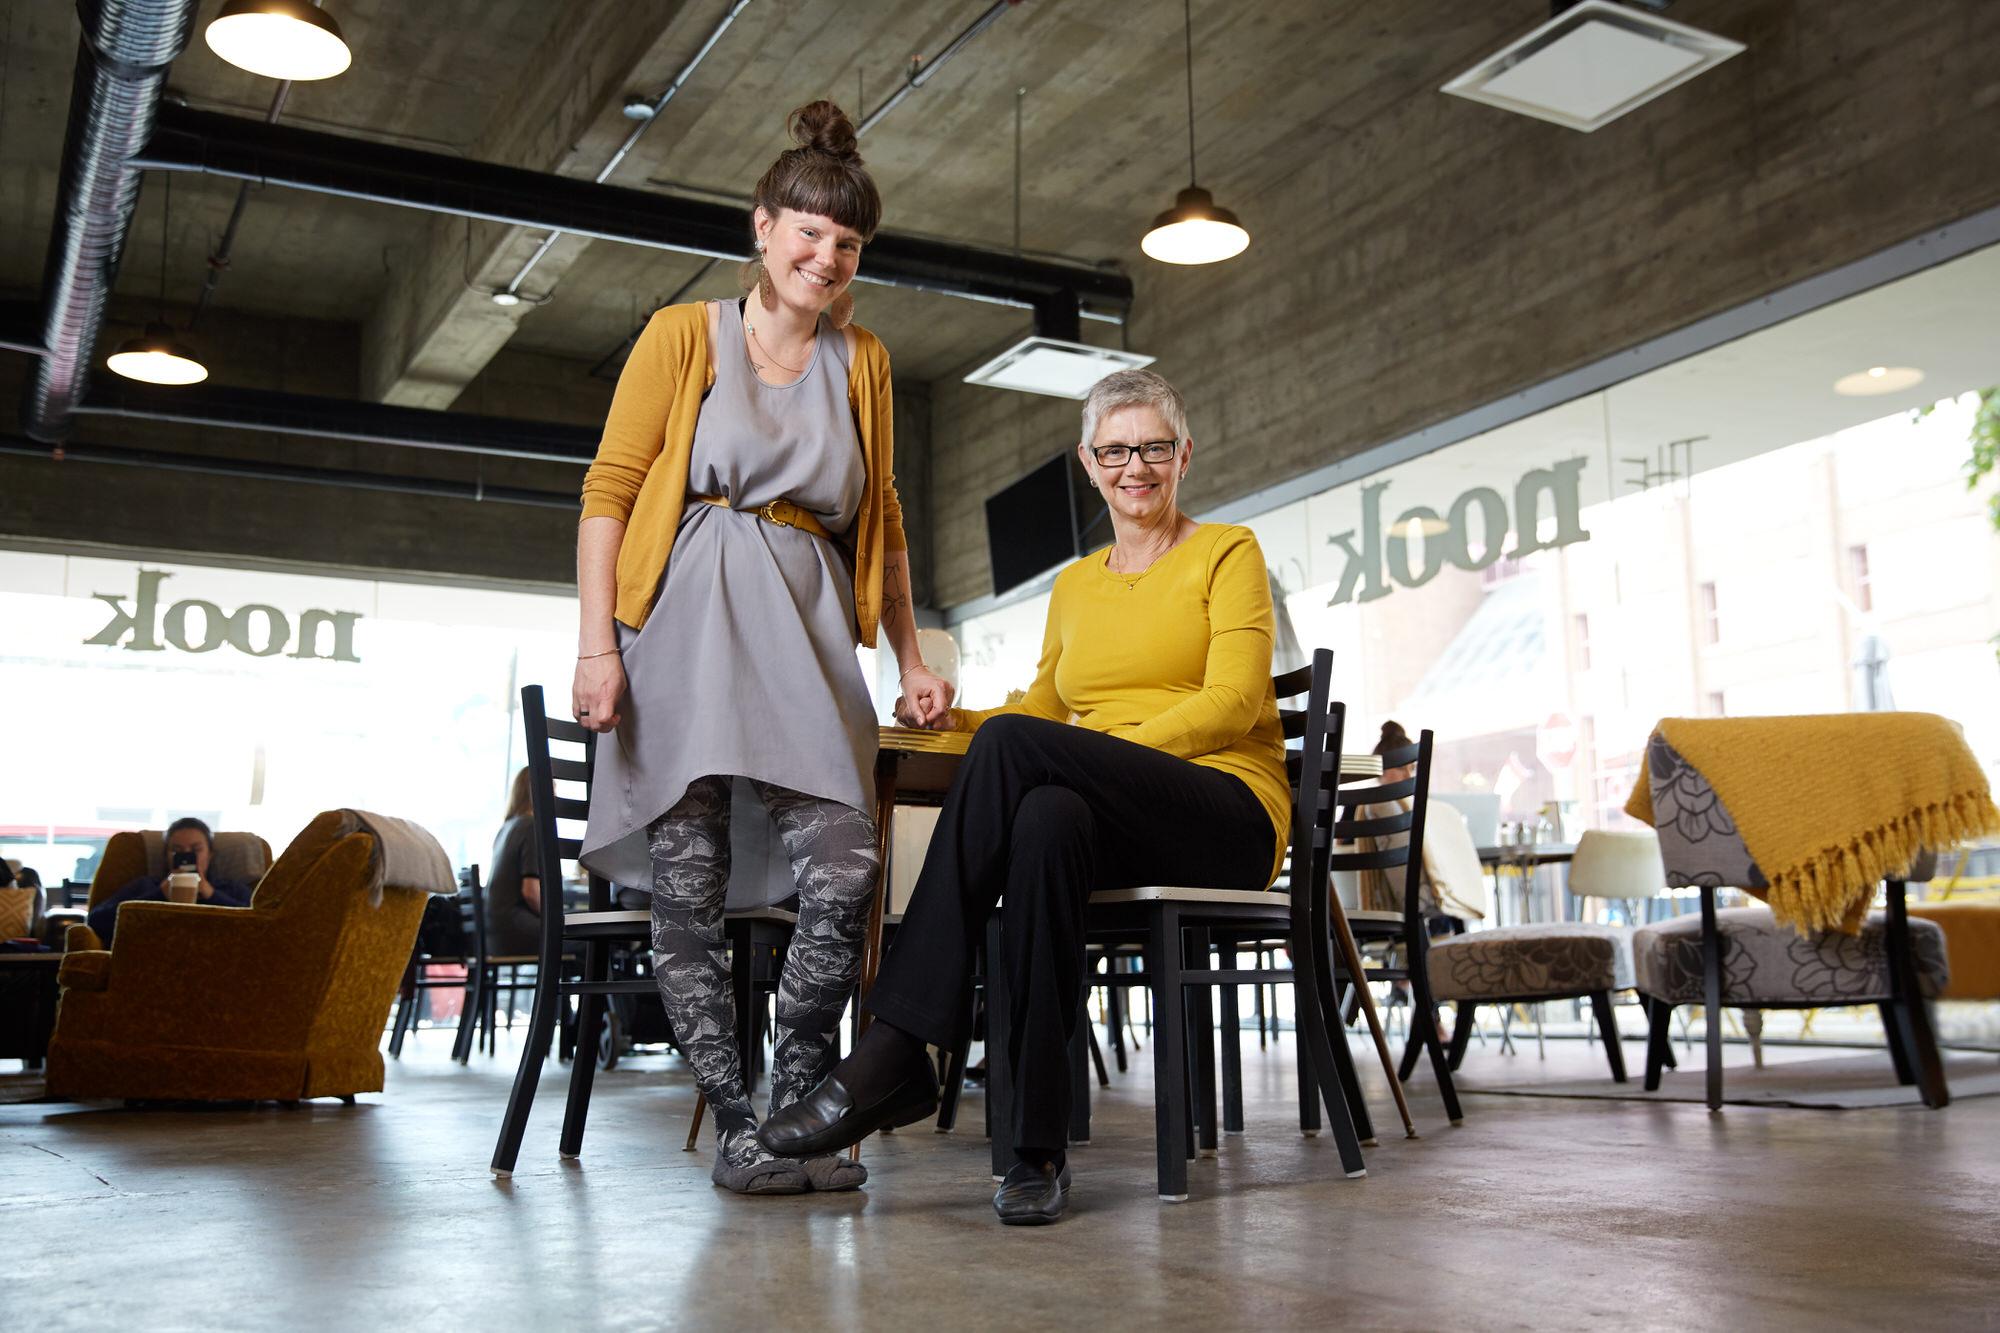 Marnie-Suitor-Lysae-Moon-Davies-Nook-Cafe-Tatawaw-Founding-Member-Ryan-Parker-Photography-Edmonton-Alberta-1.jpg